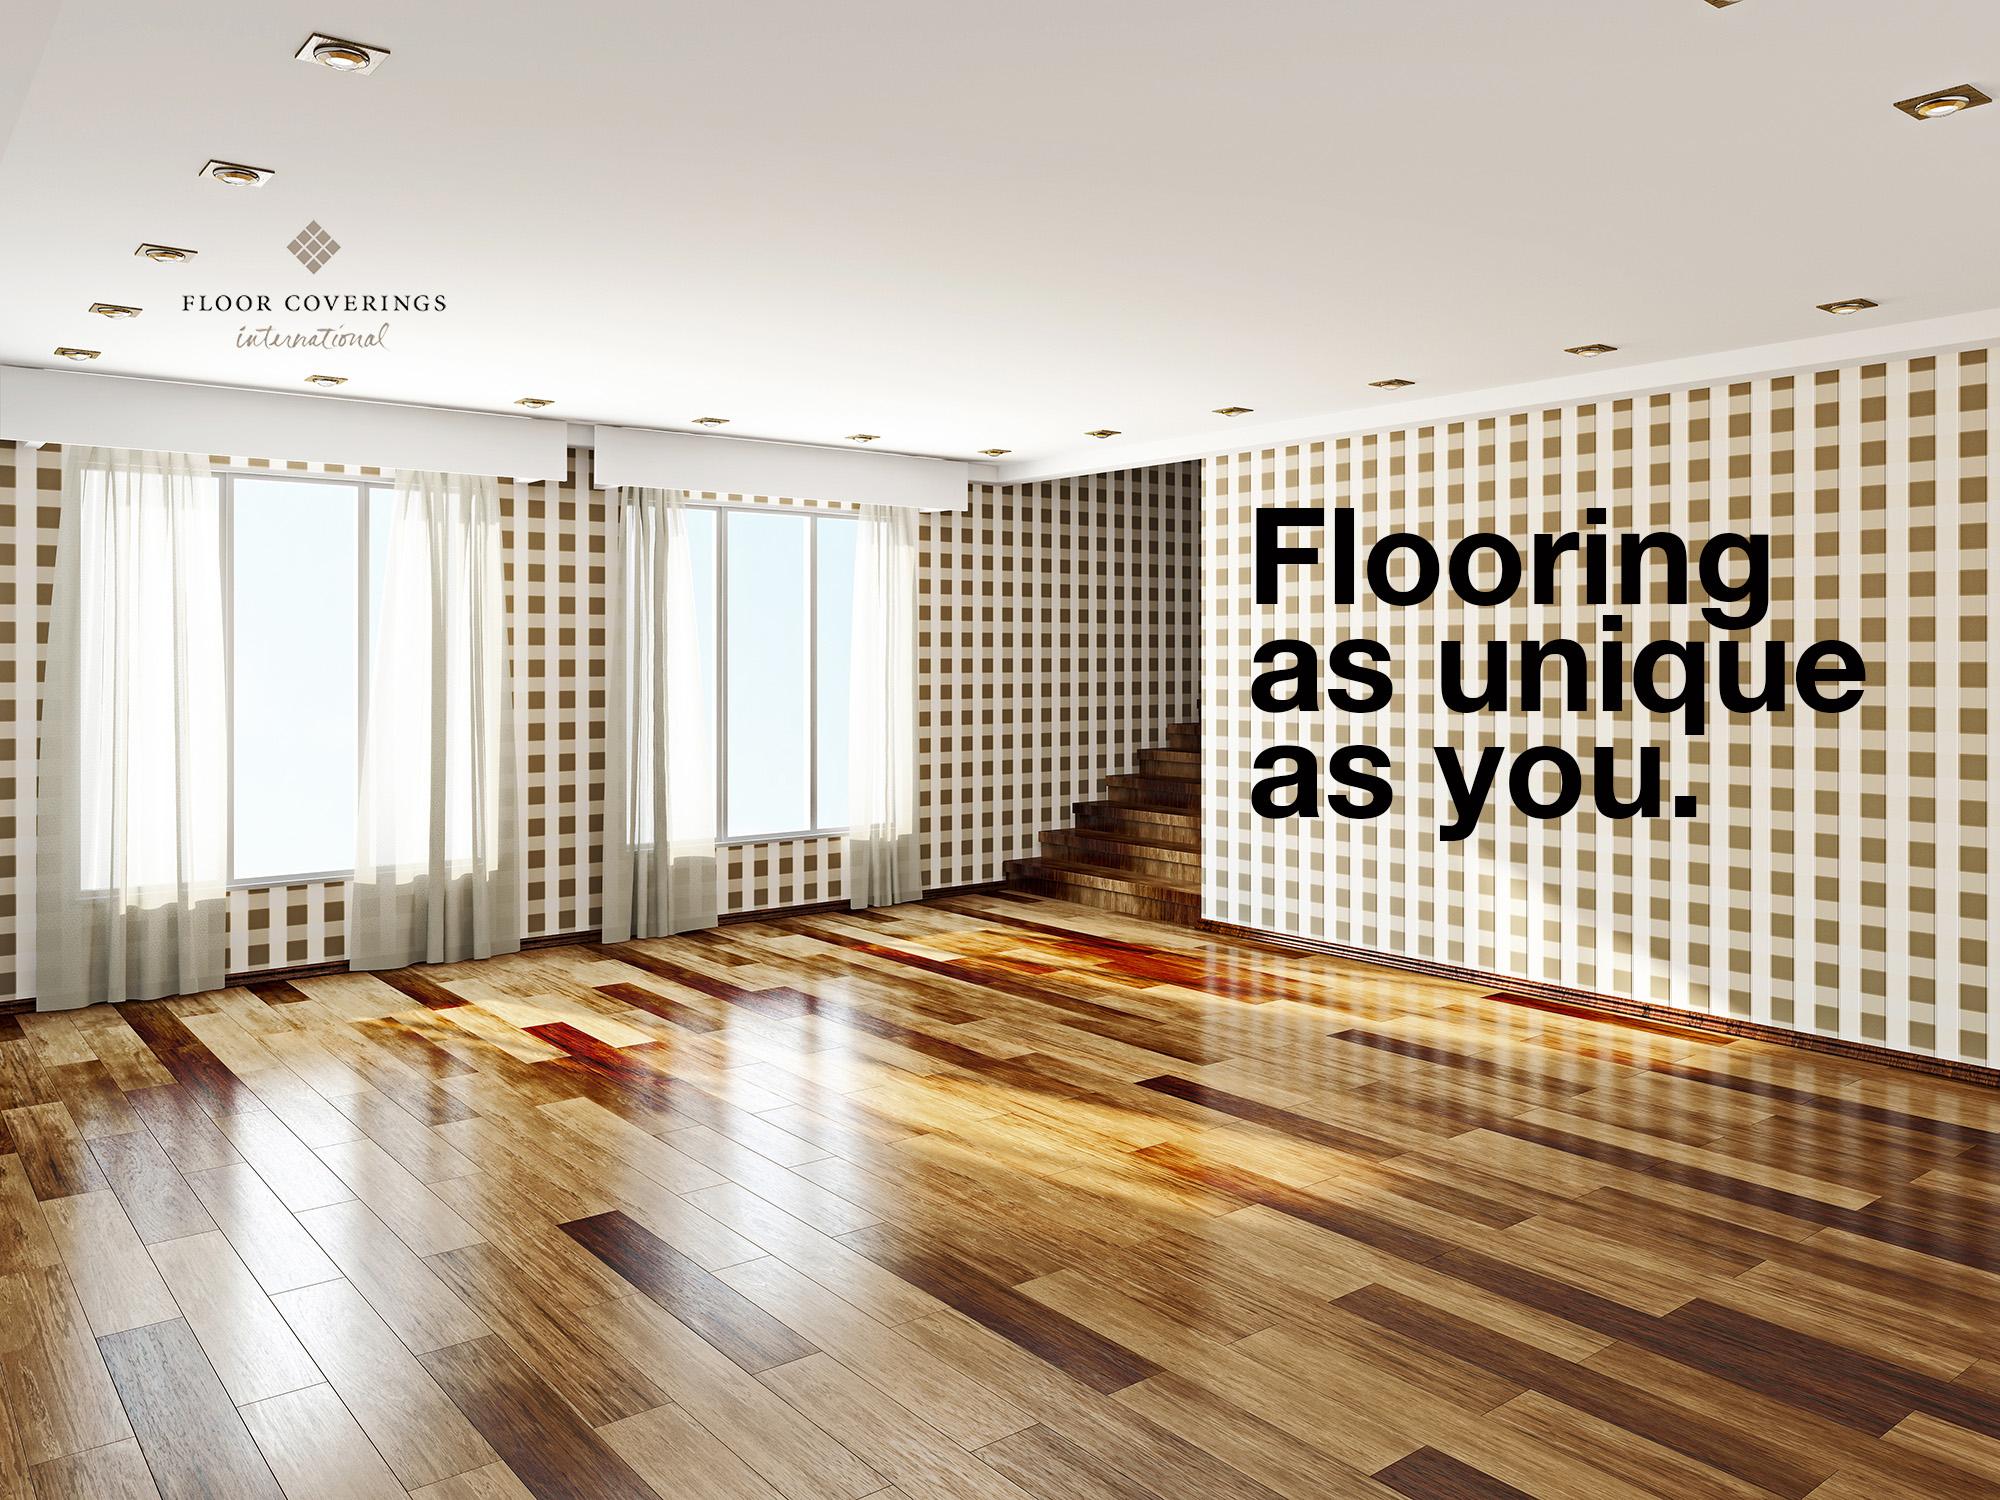 Flooring as unique as you